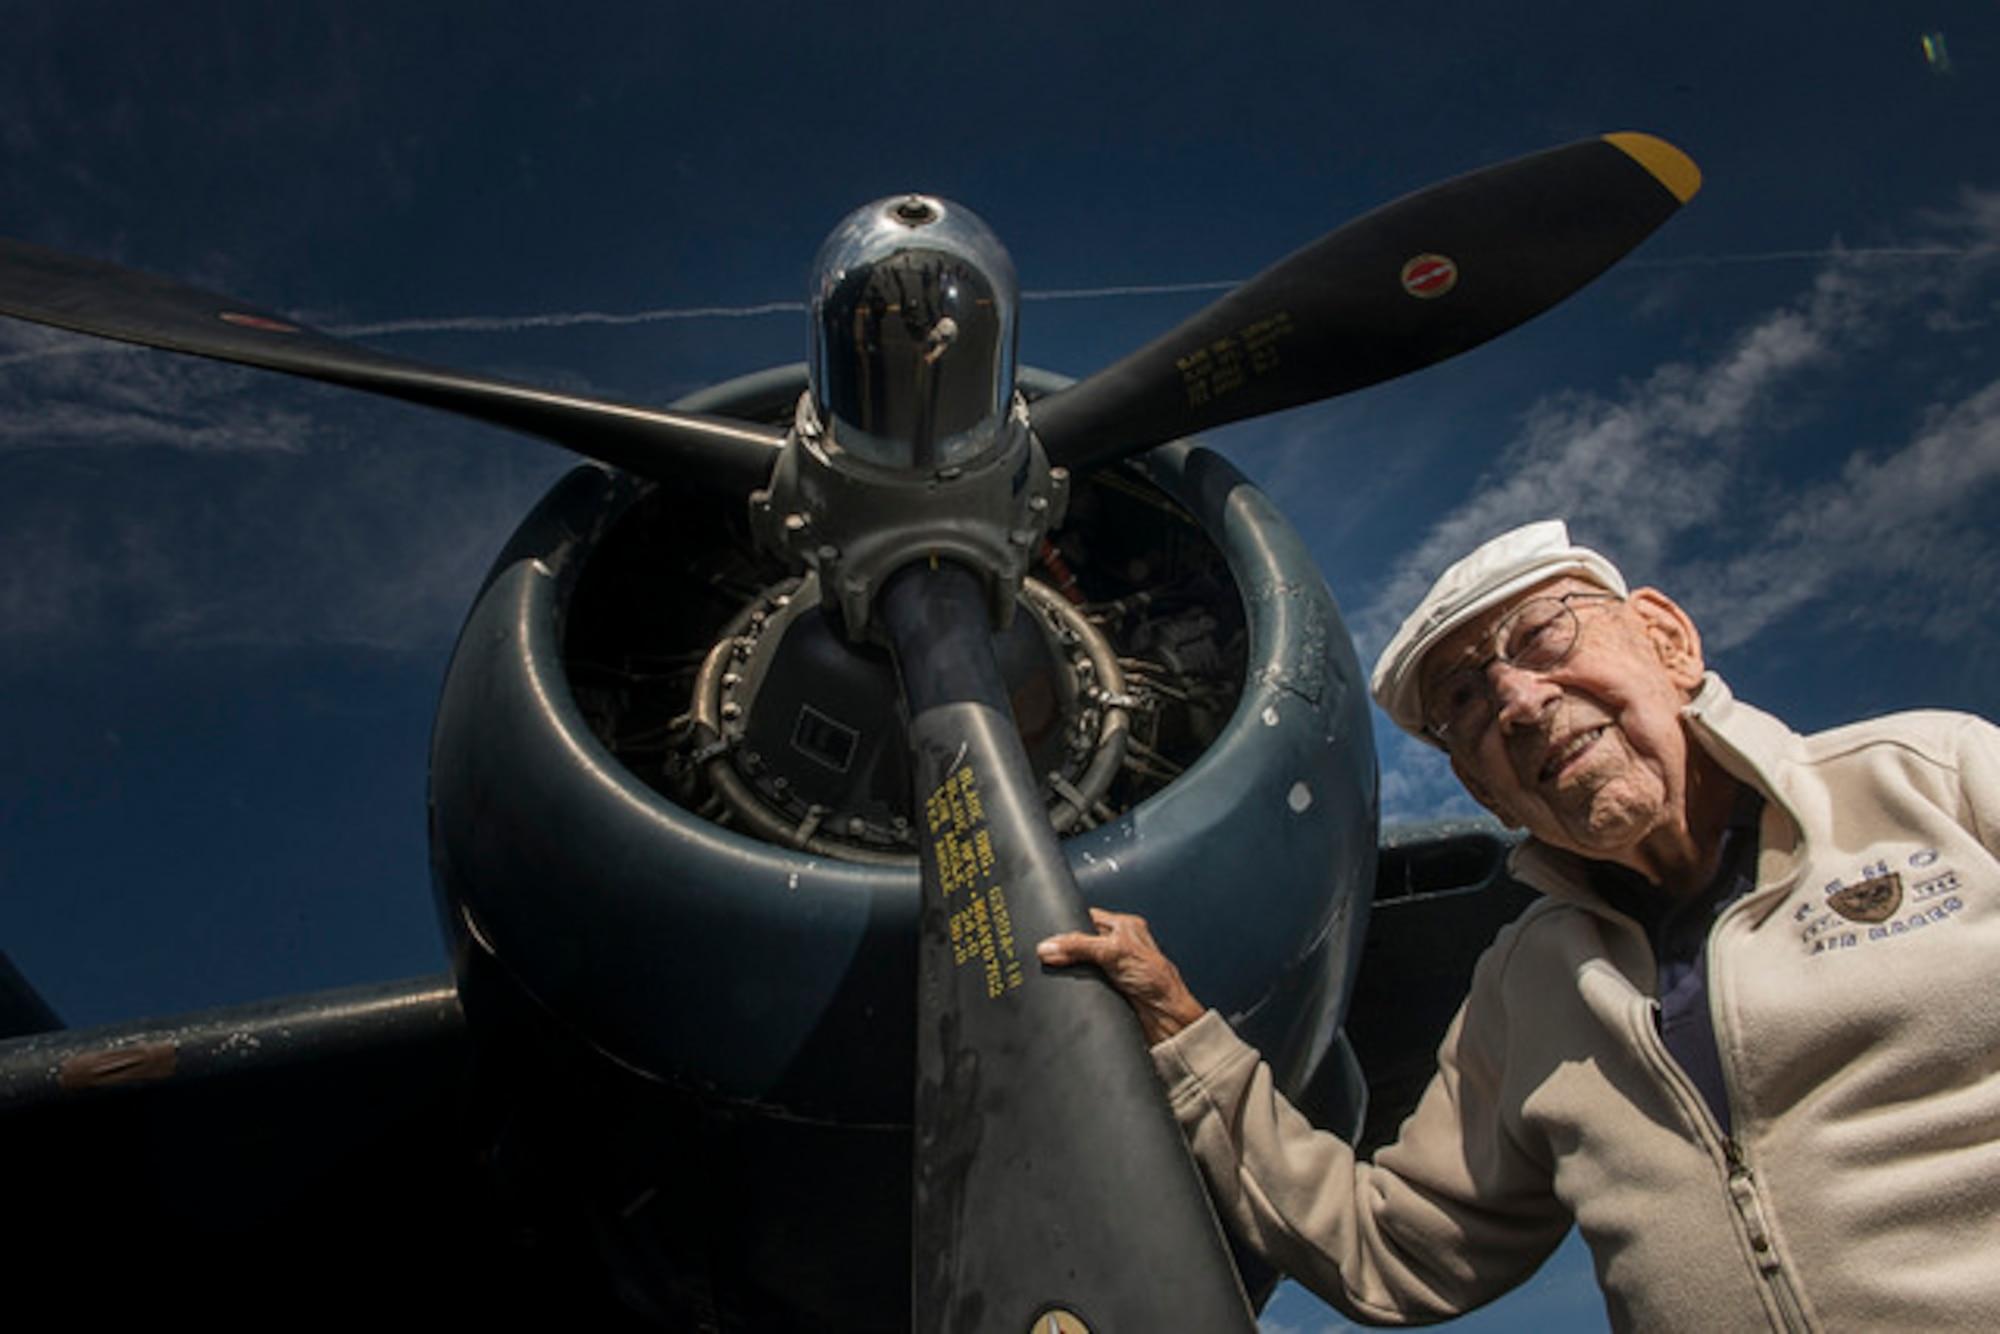 U.S. Air Force Retired Lt. Col. Richard E. Cole